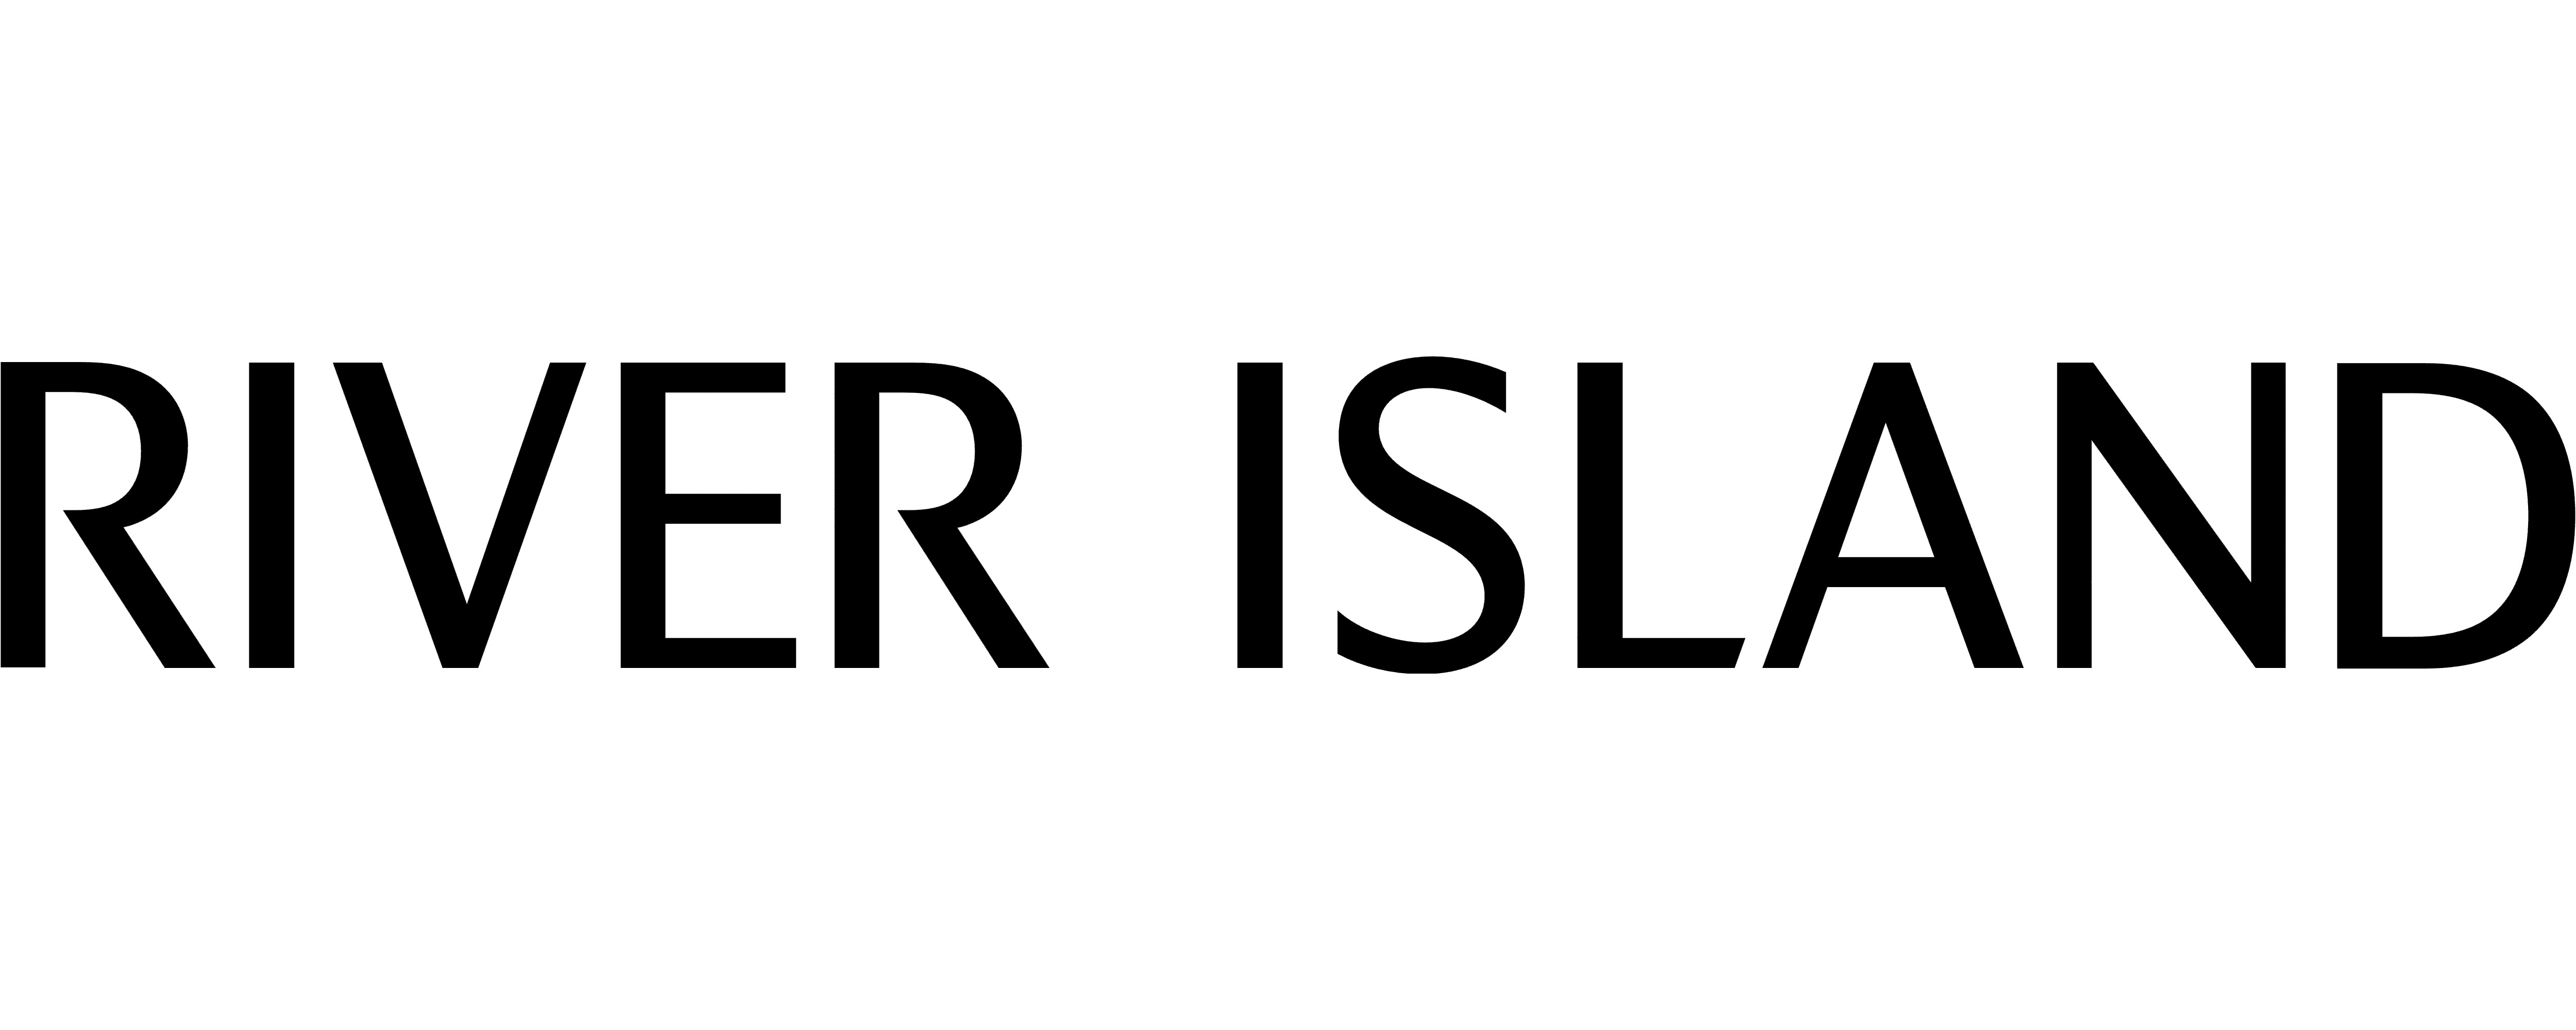 River Island Student Discounts logo